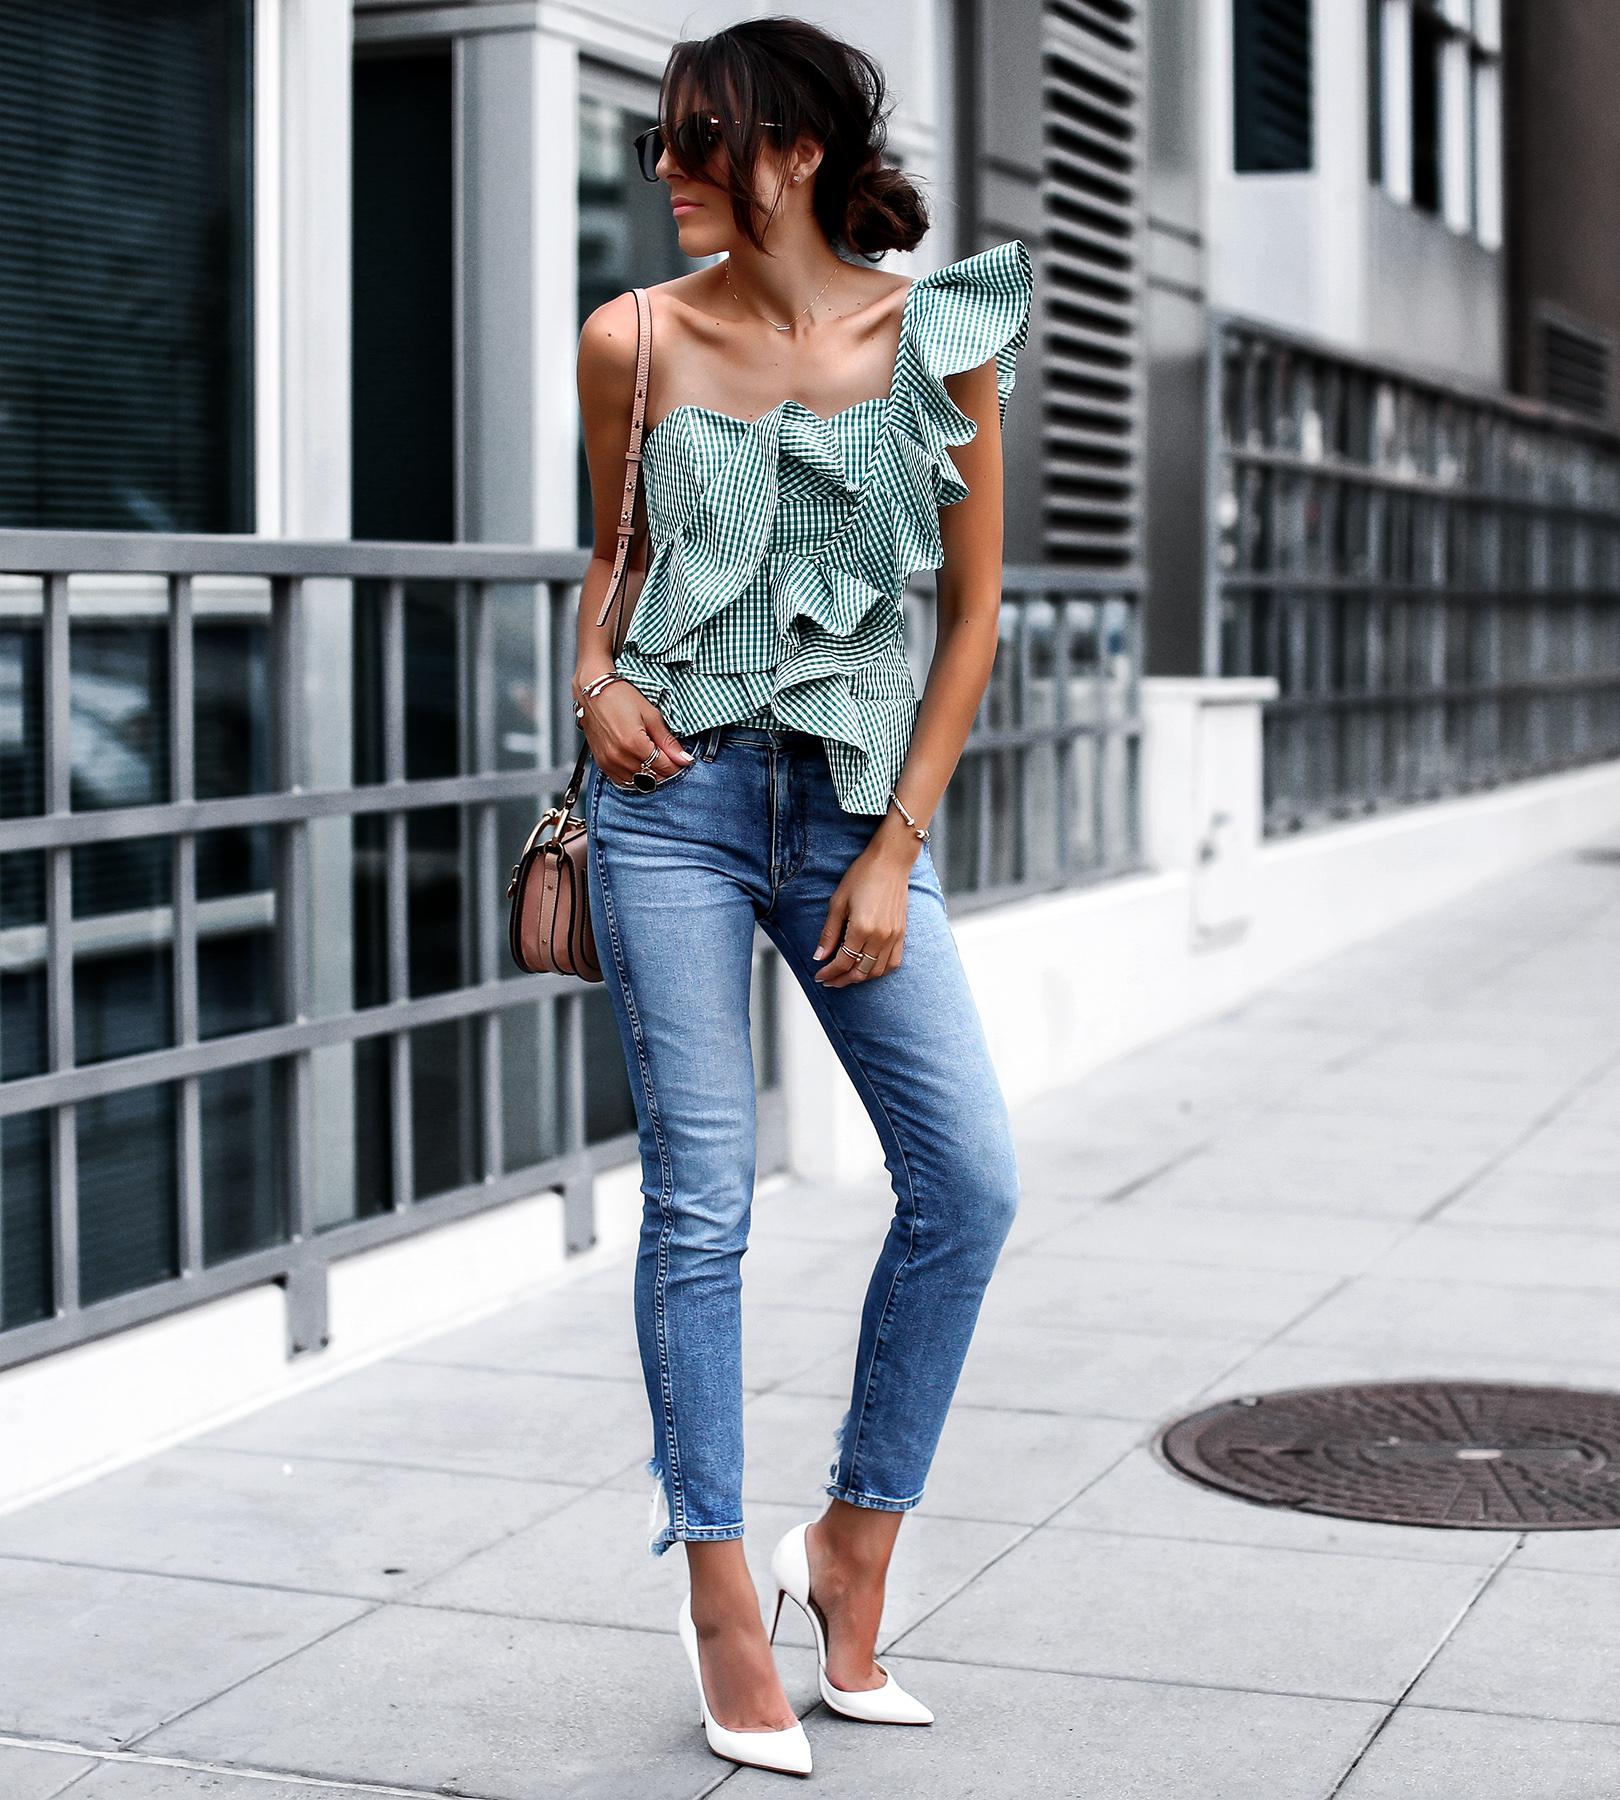 Stylekeepers Ruffled Bustier Top with 3x1 Denim Chloe Nile Bag Christian Louboutin White Pumps.jpg